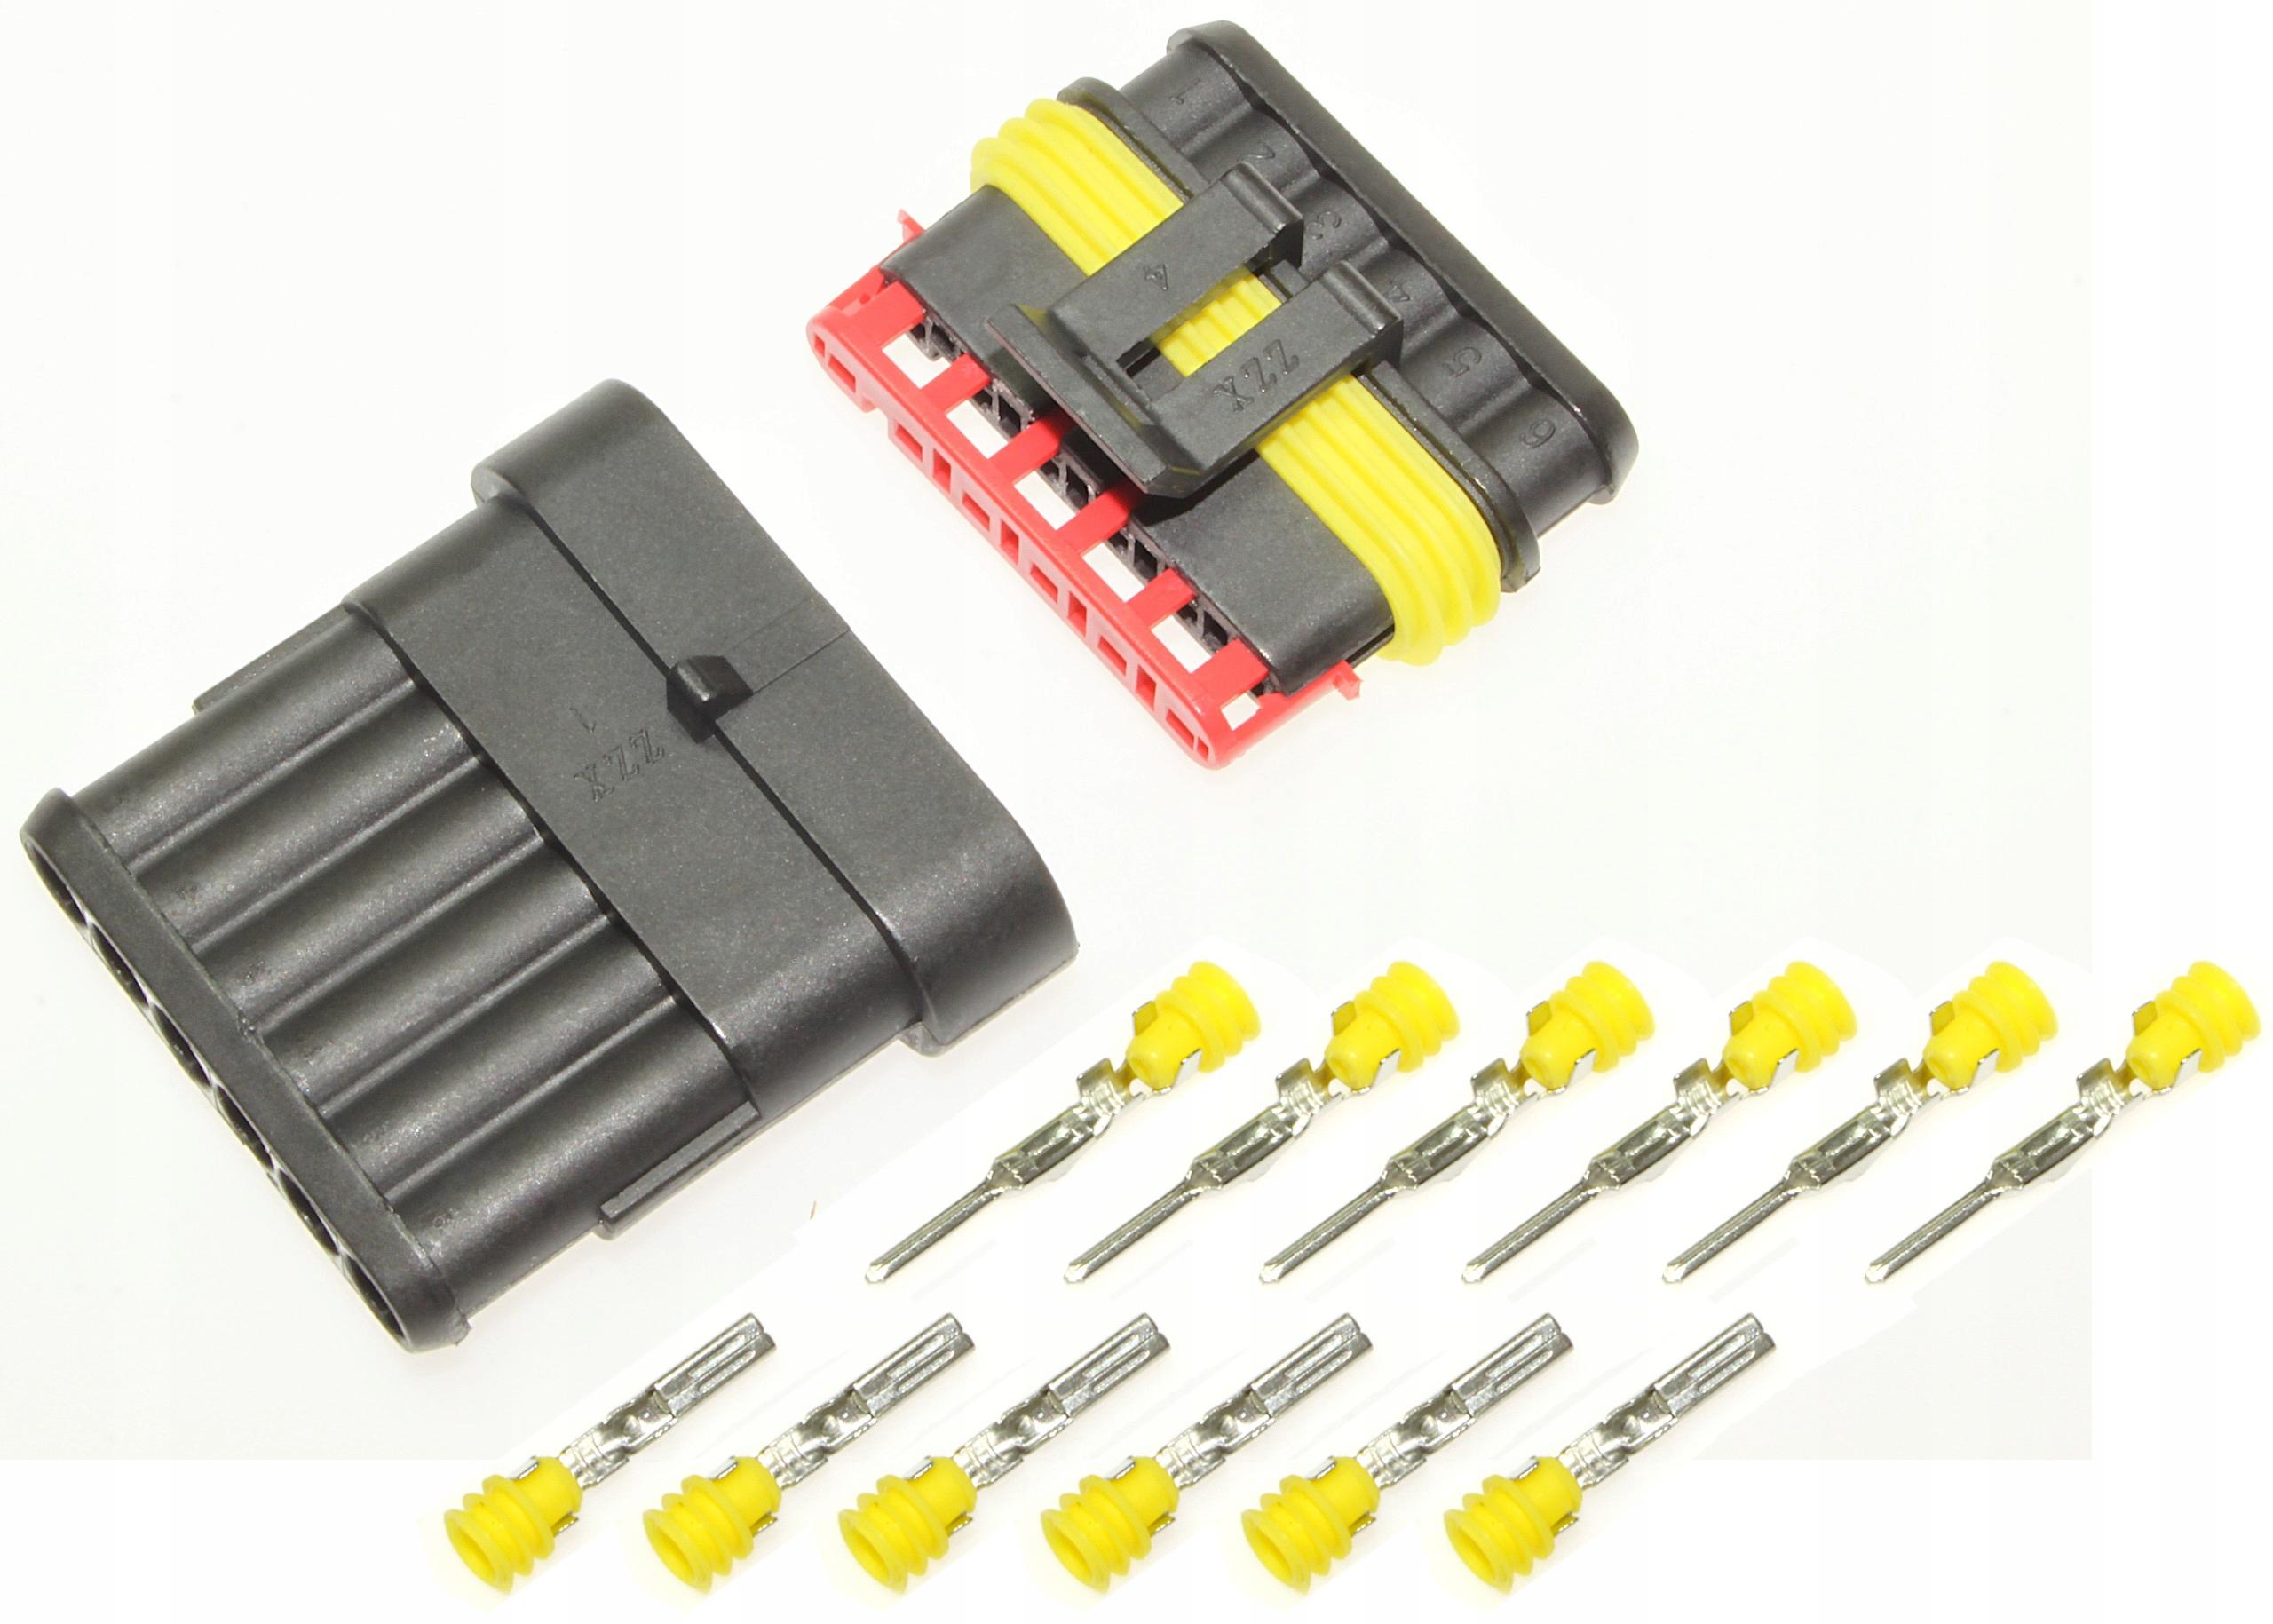 разъем герметичные superseal кубик разъем 6 pin